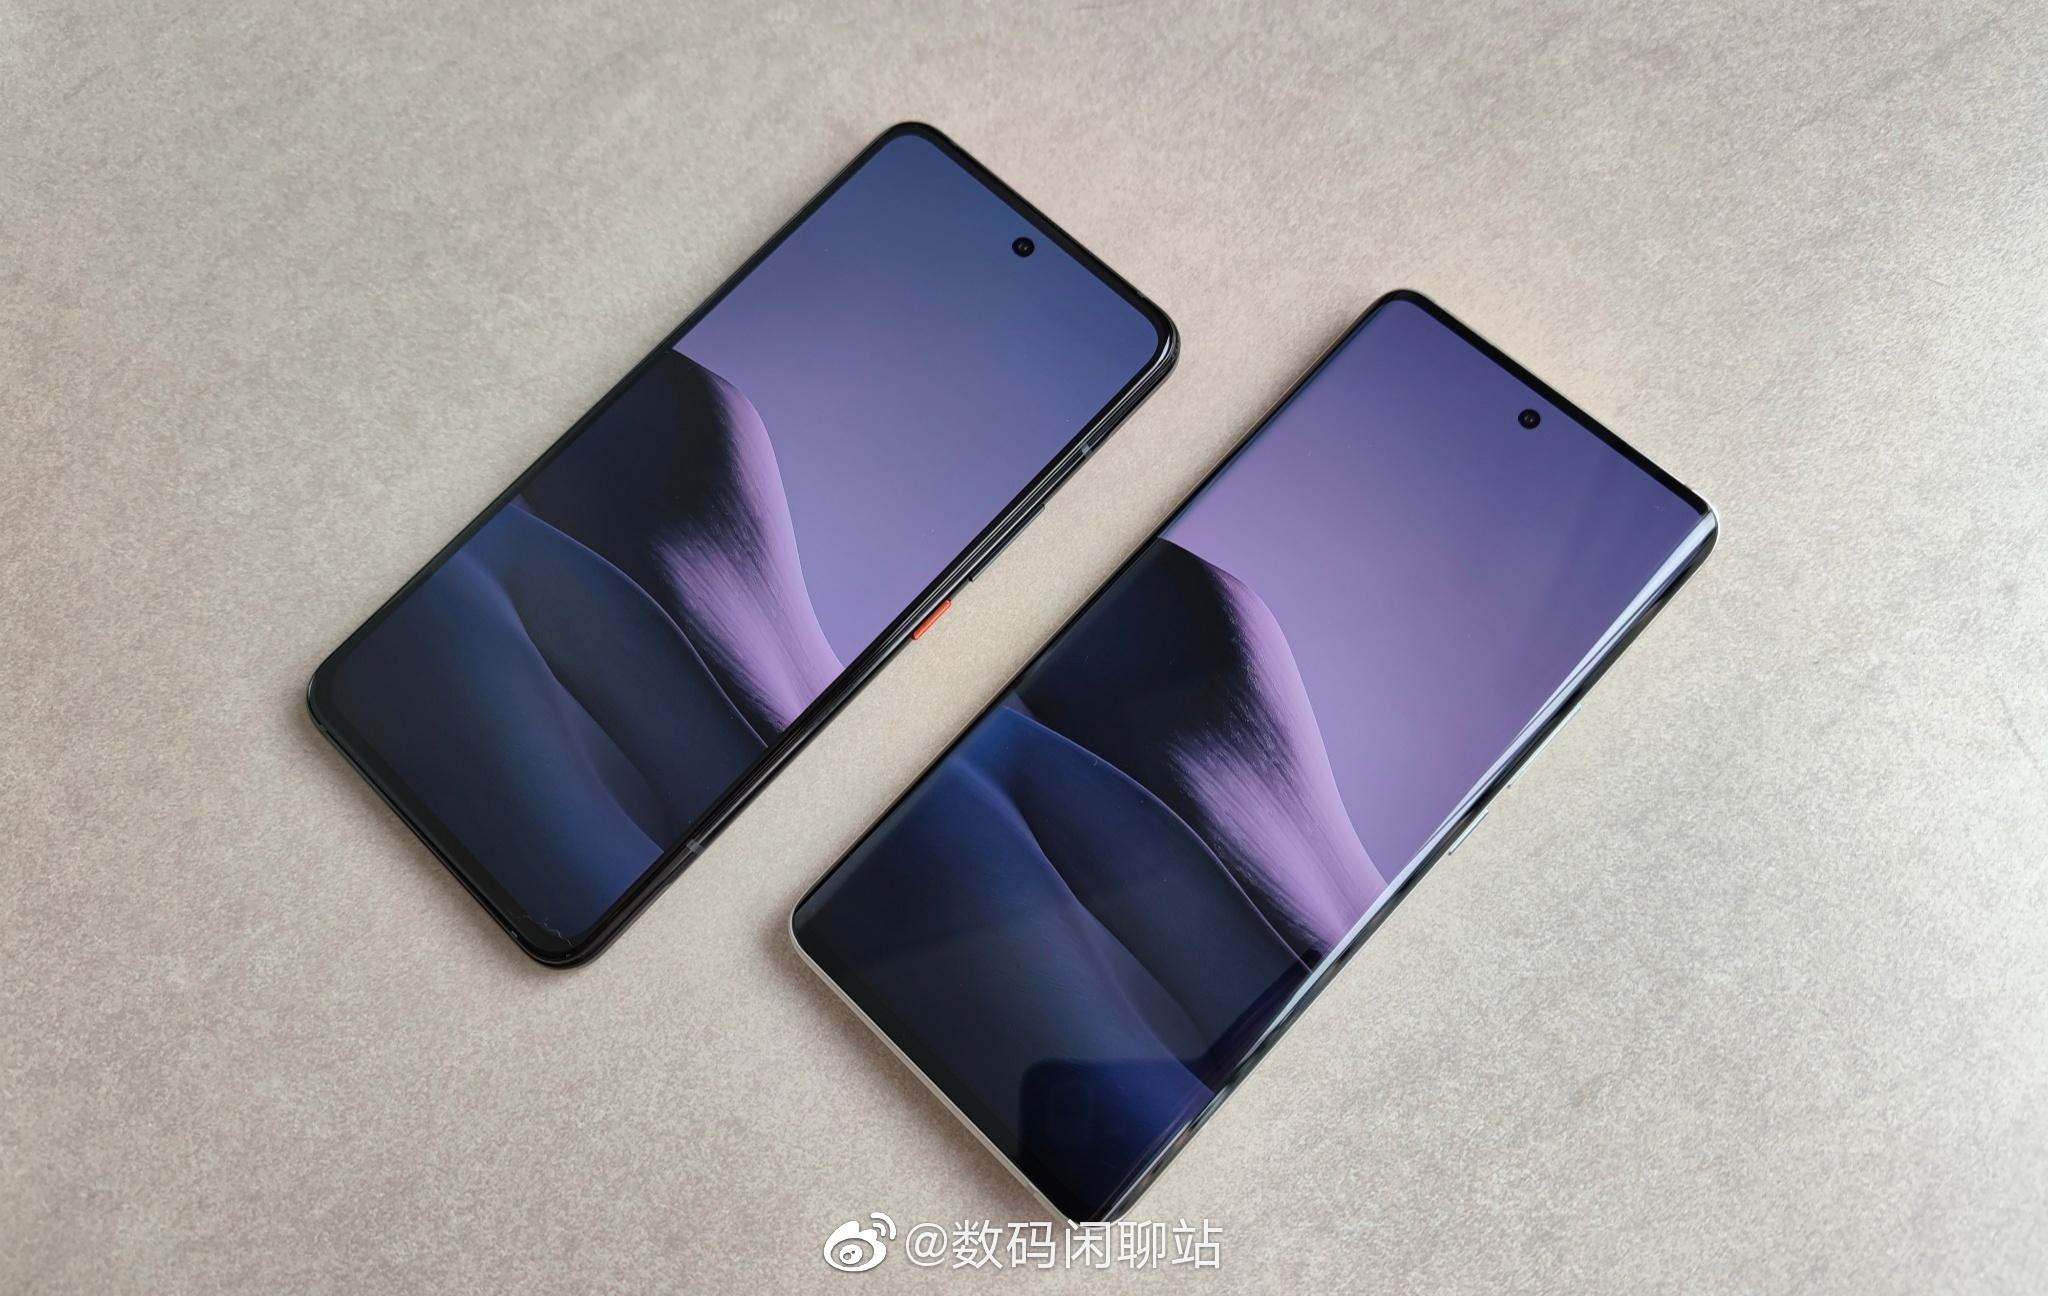 Xiaomi Mi 11 e Mi 11 Pro